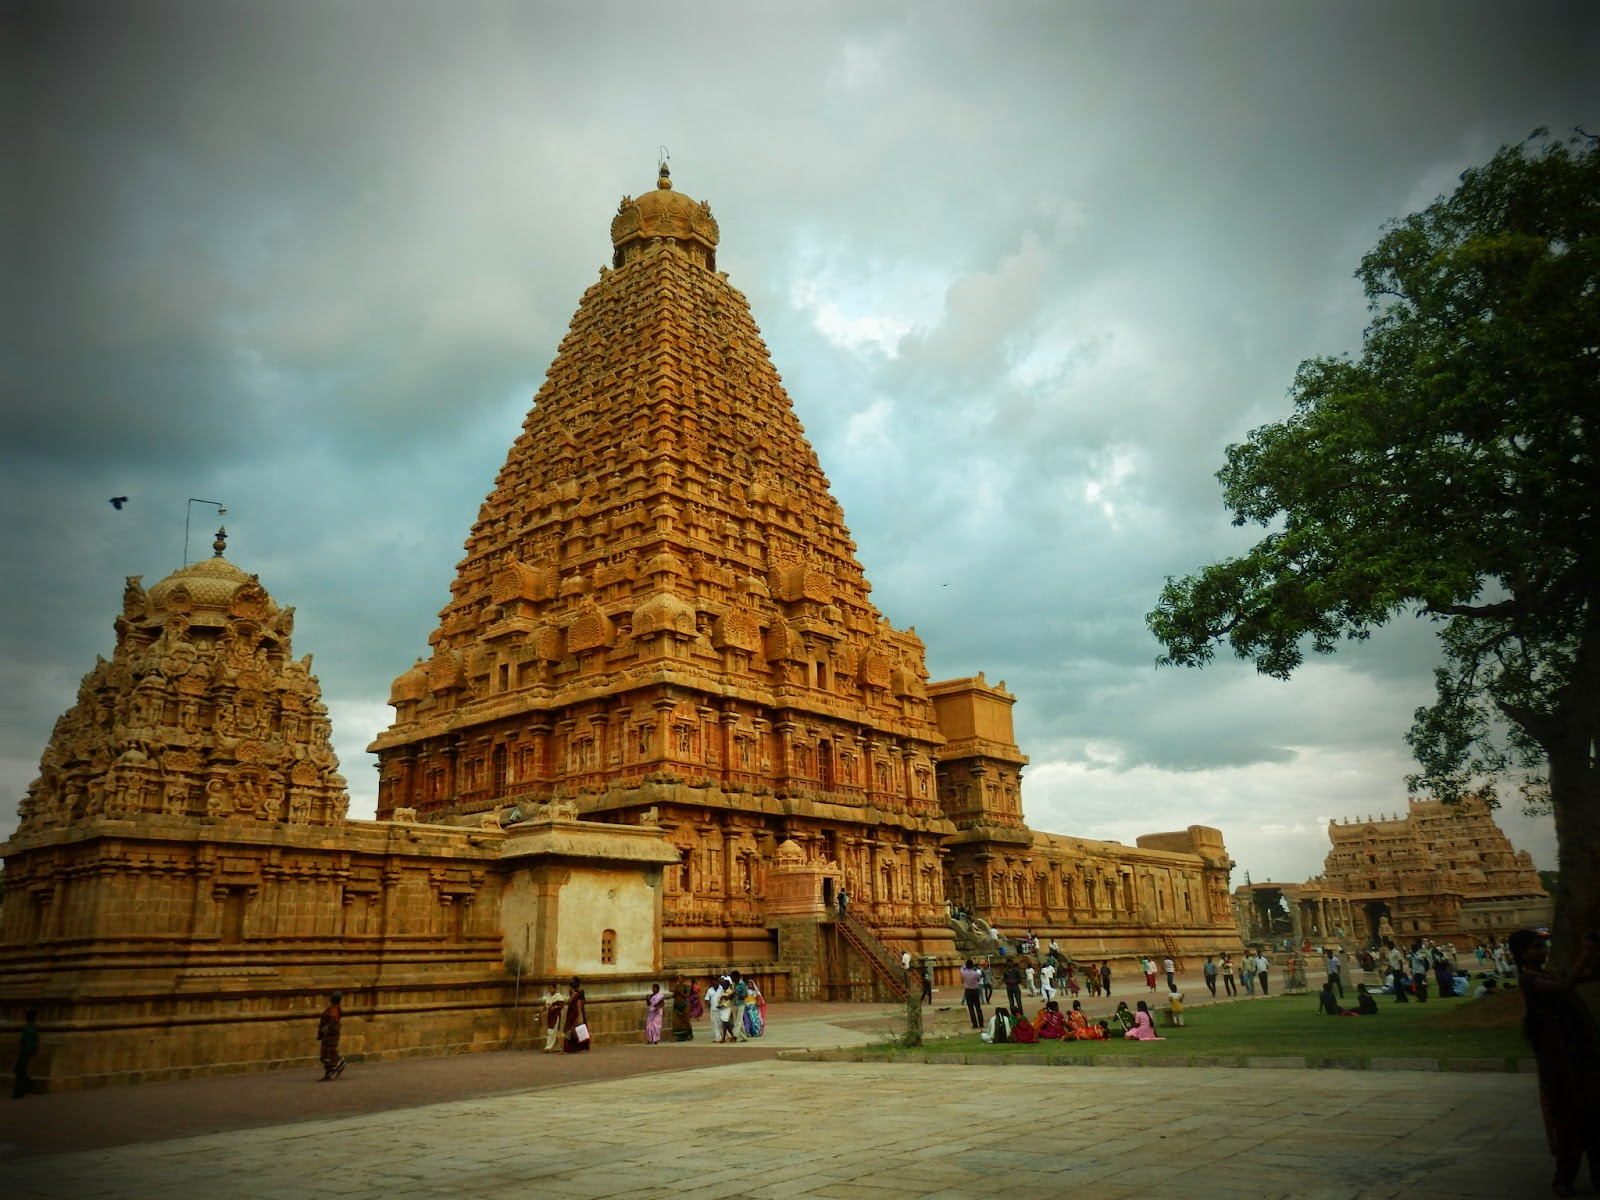 Interesting Facts About The Brihadeeshwara Temple Of Thanjavur